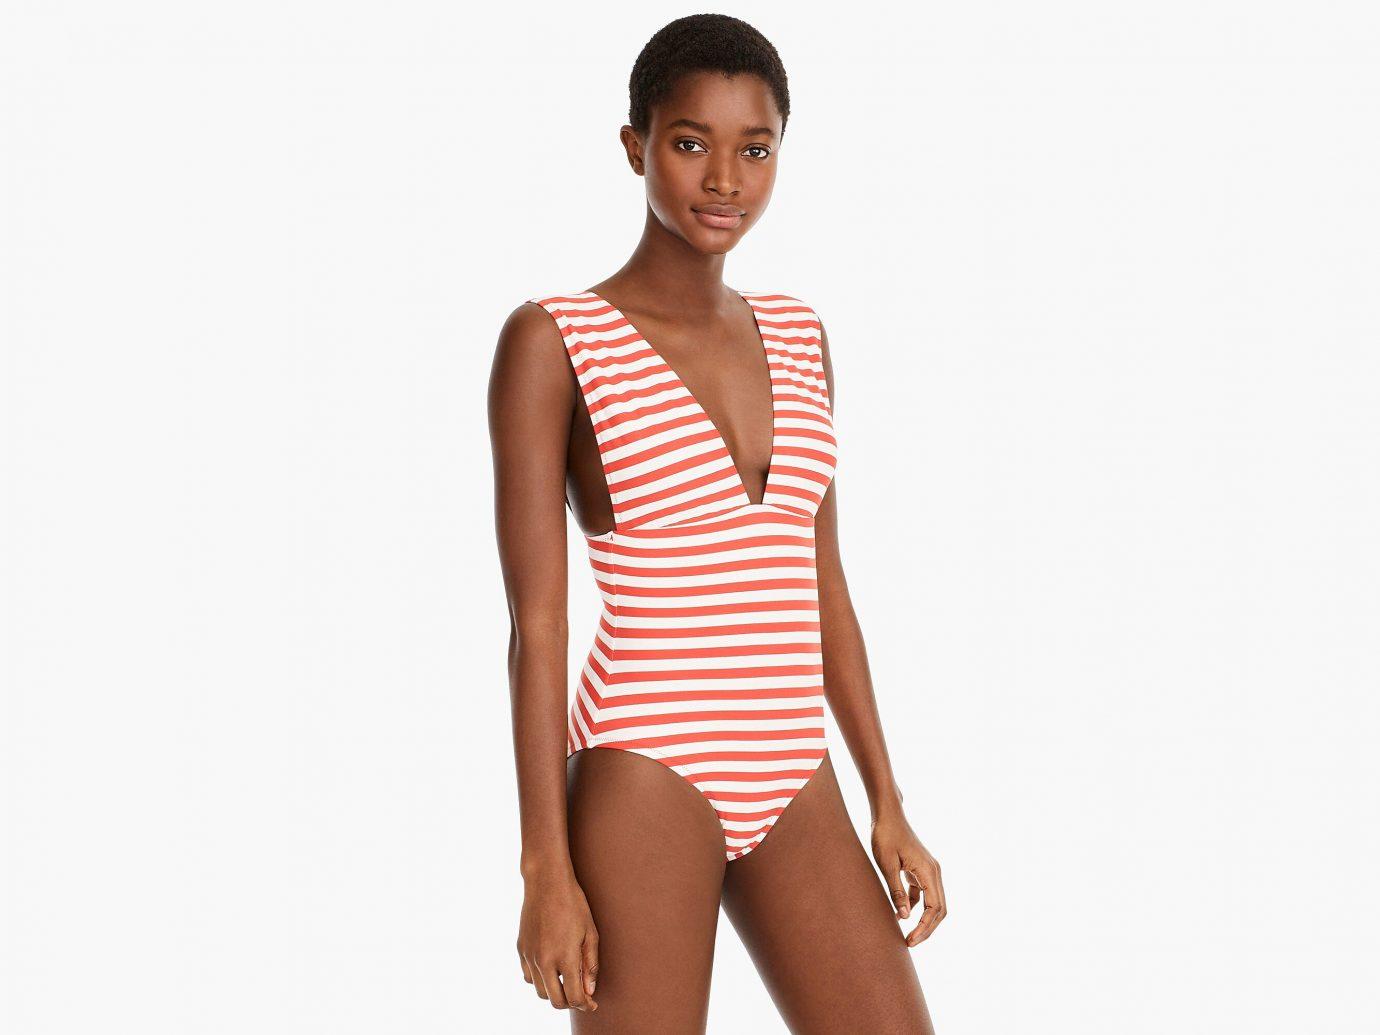 J.Crew Plunge V-neck one piece swimsuit in classic stripe